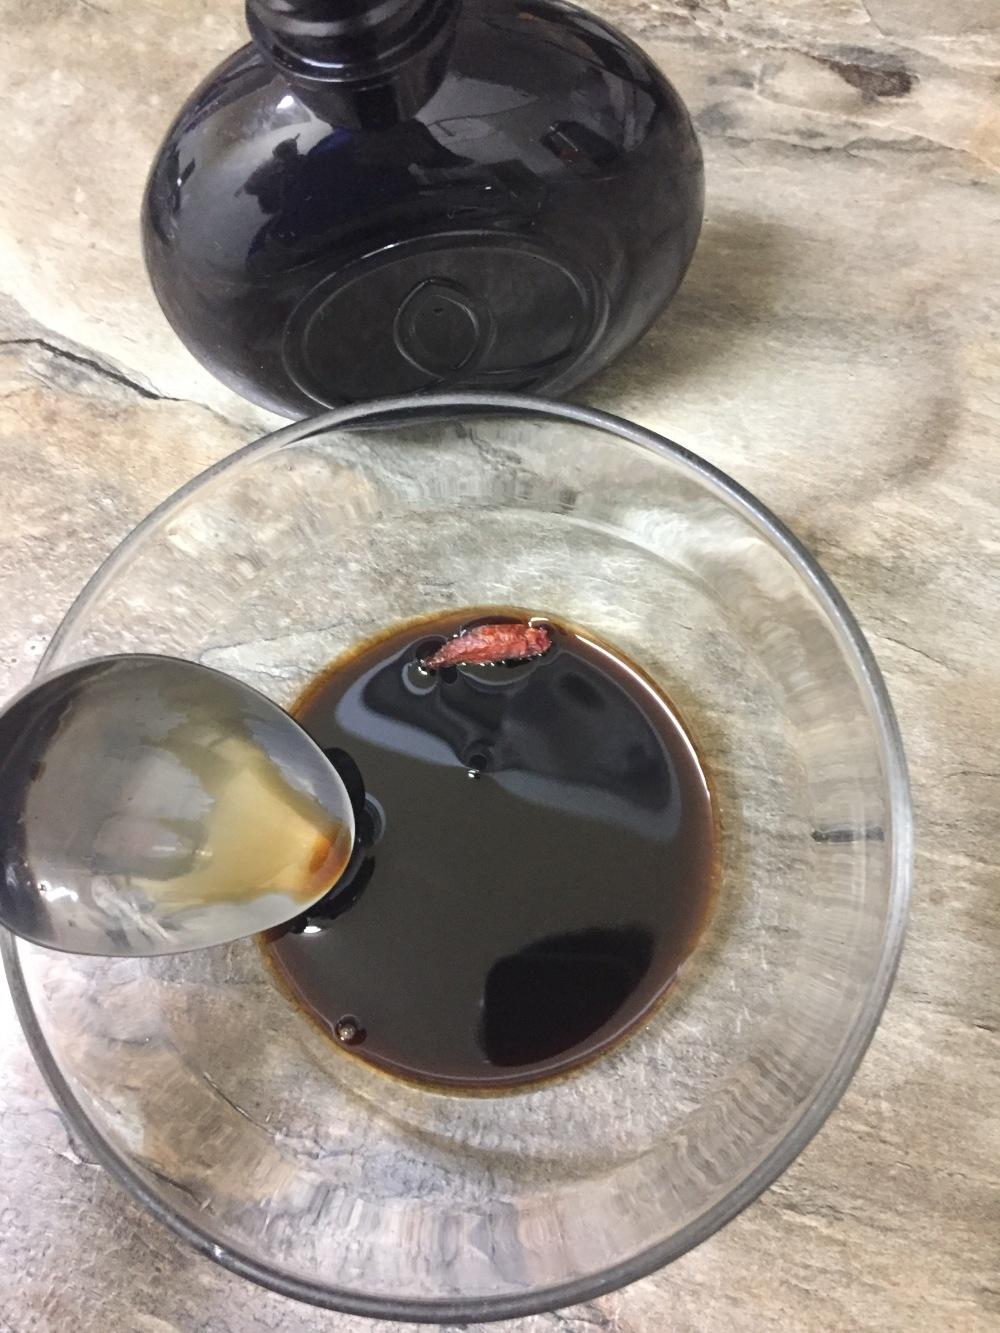 brocoli en tempura con salsa de cacahuete (2)